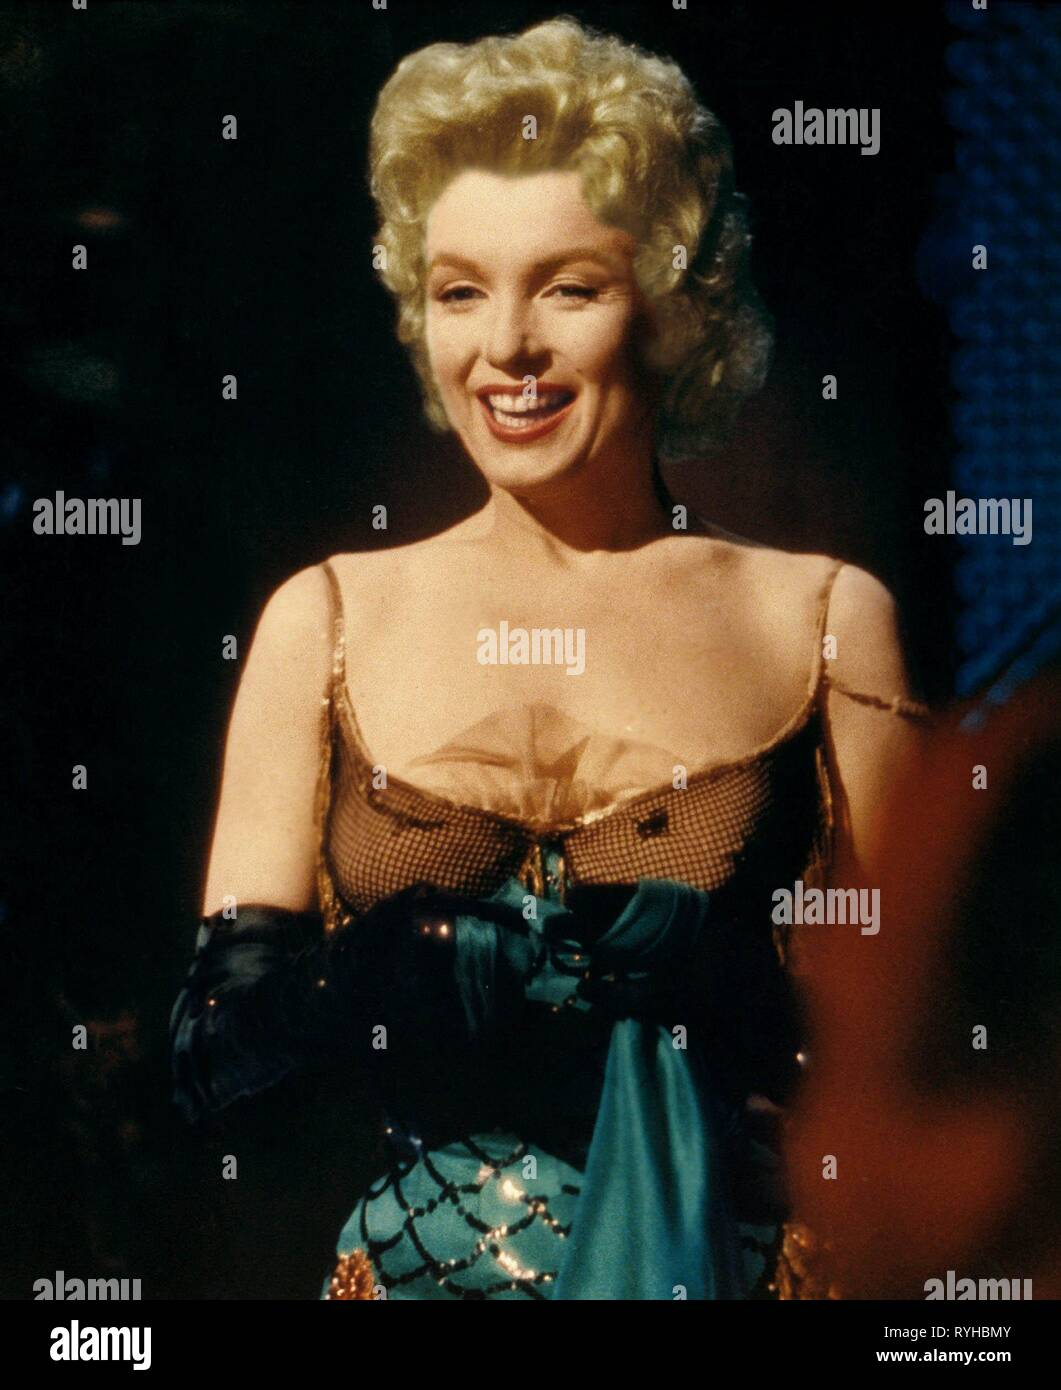 BUS STOP, MARILYN MONROE, 1956 - Stock Image